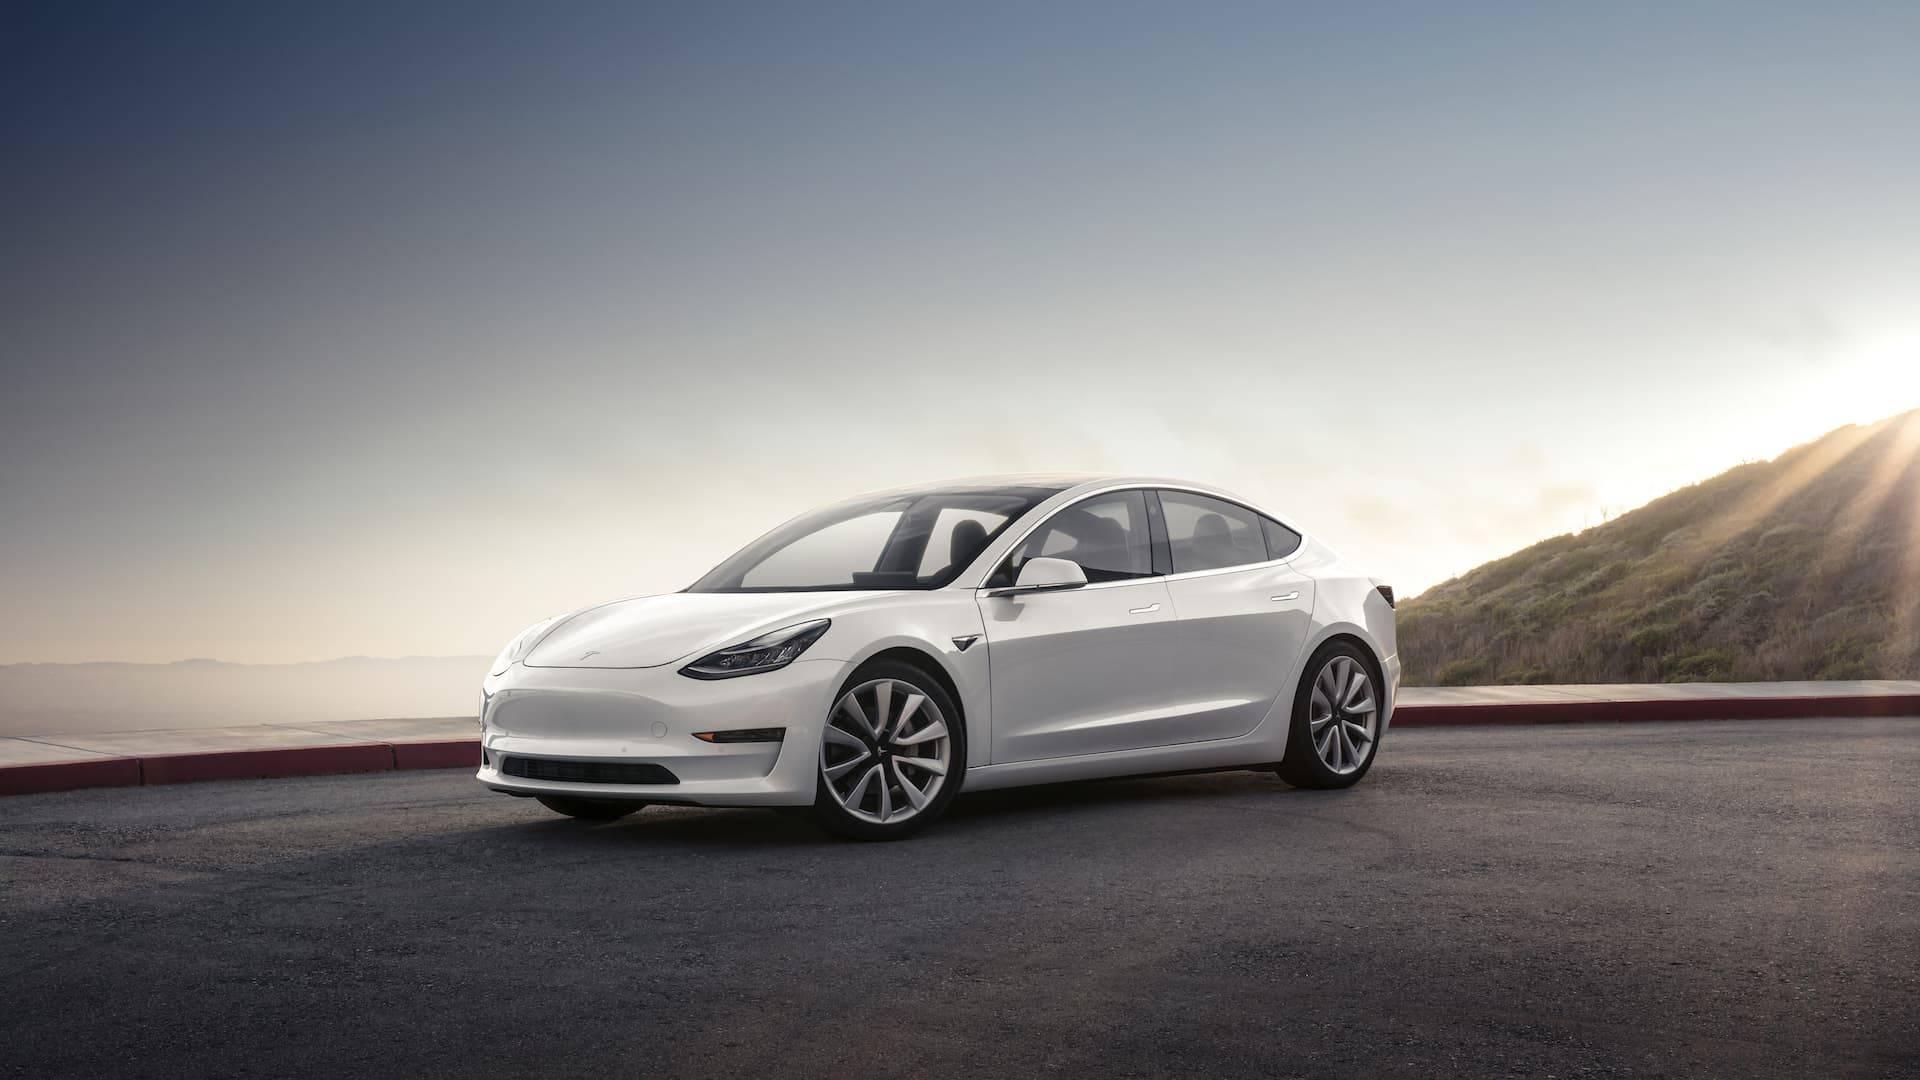 Prueba de manejo – Tesla Model 3